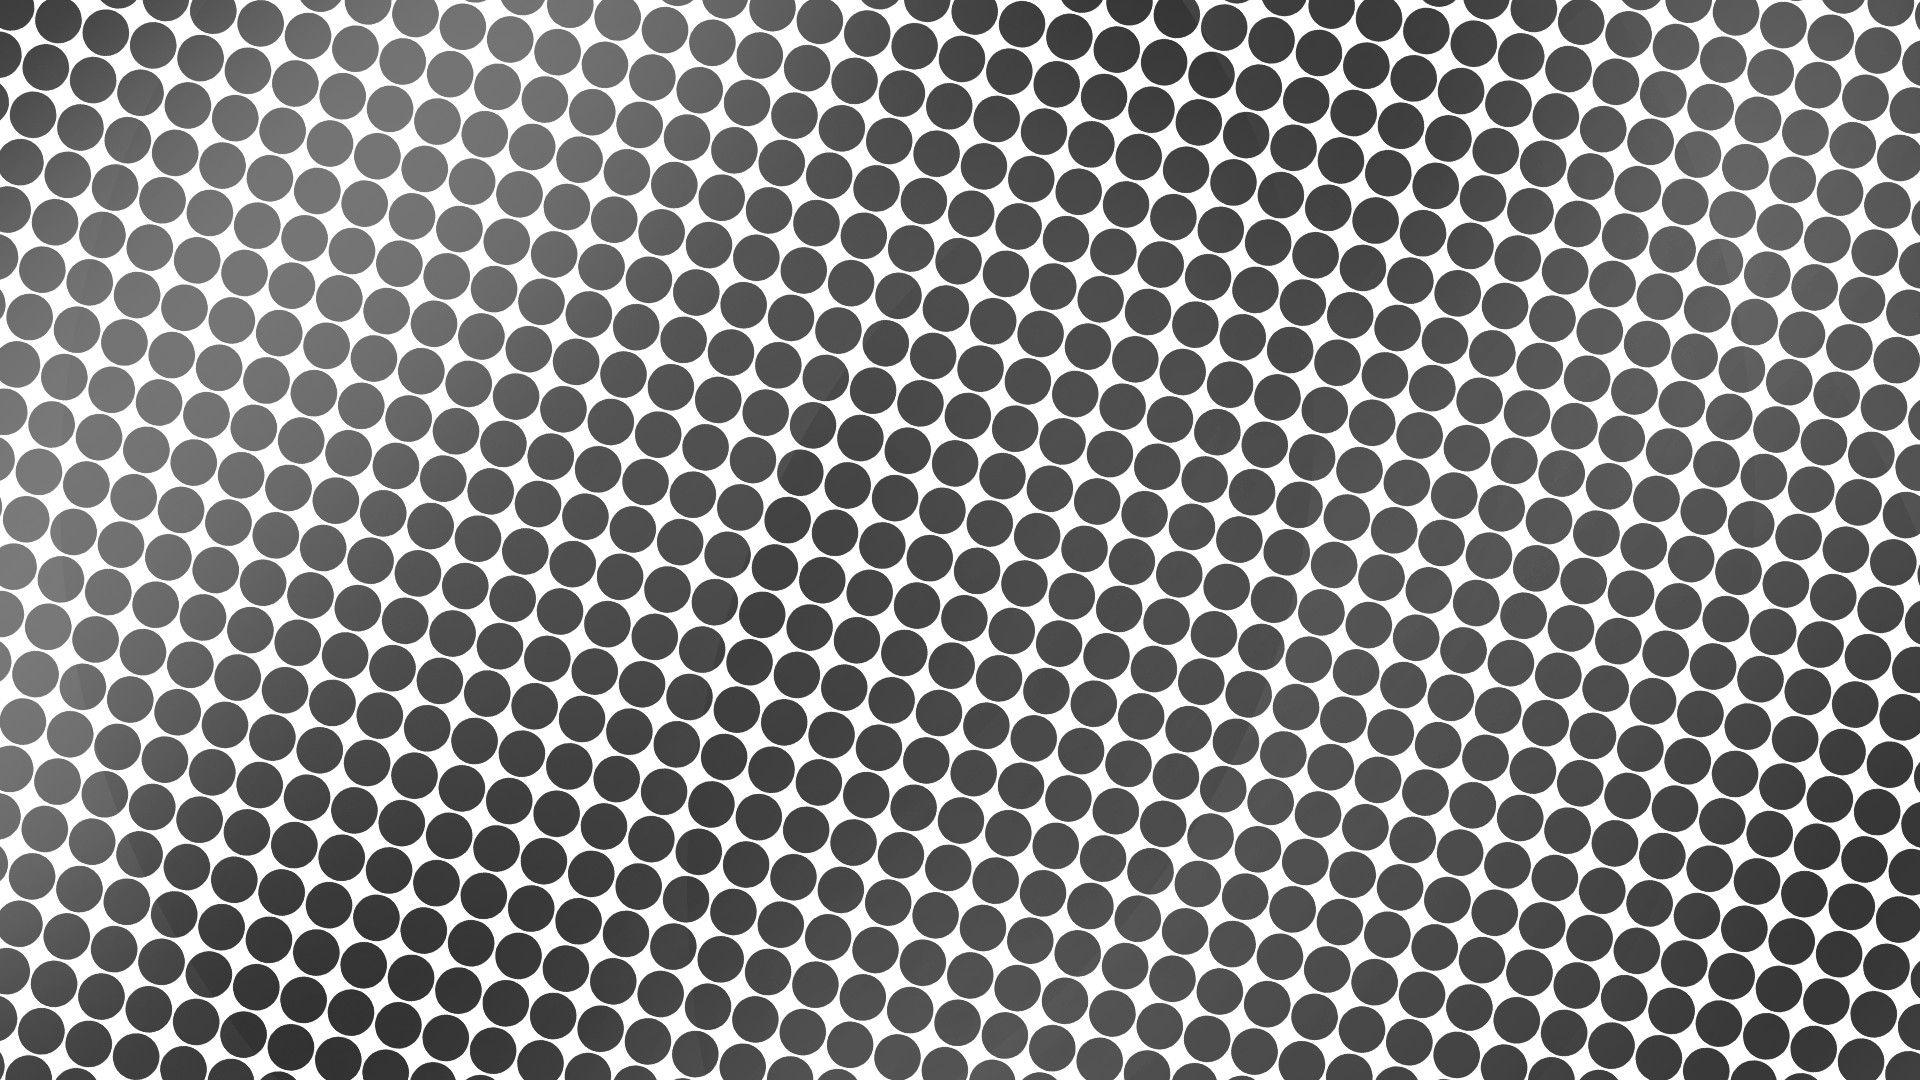 Dots download nice wallpaper